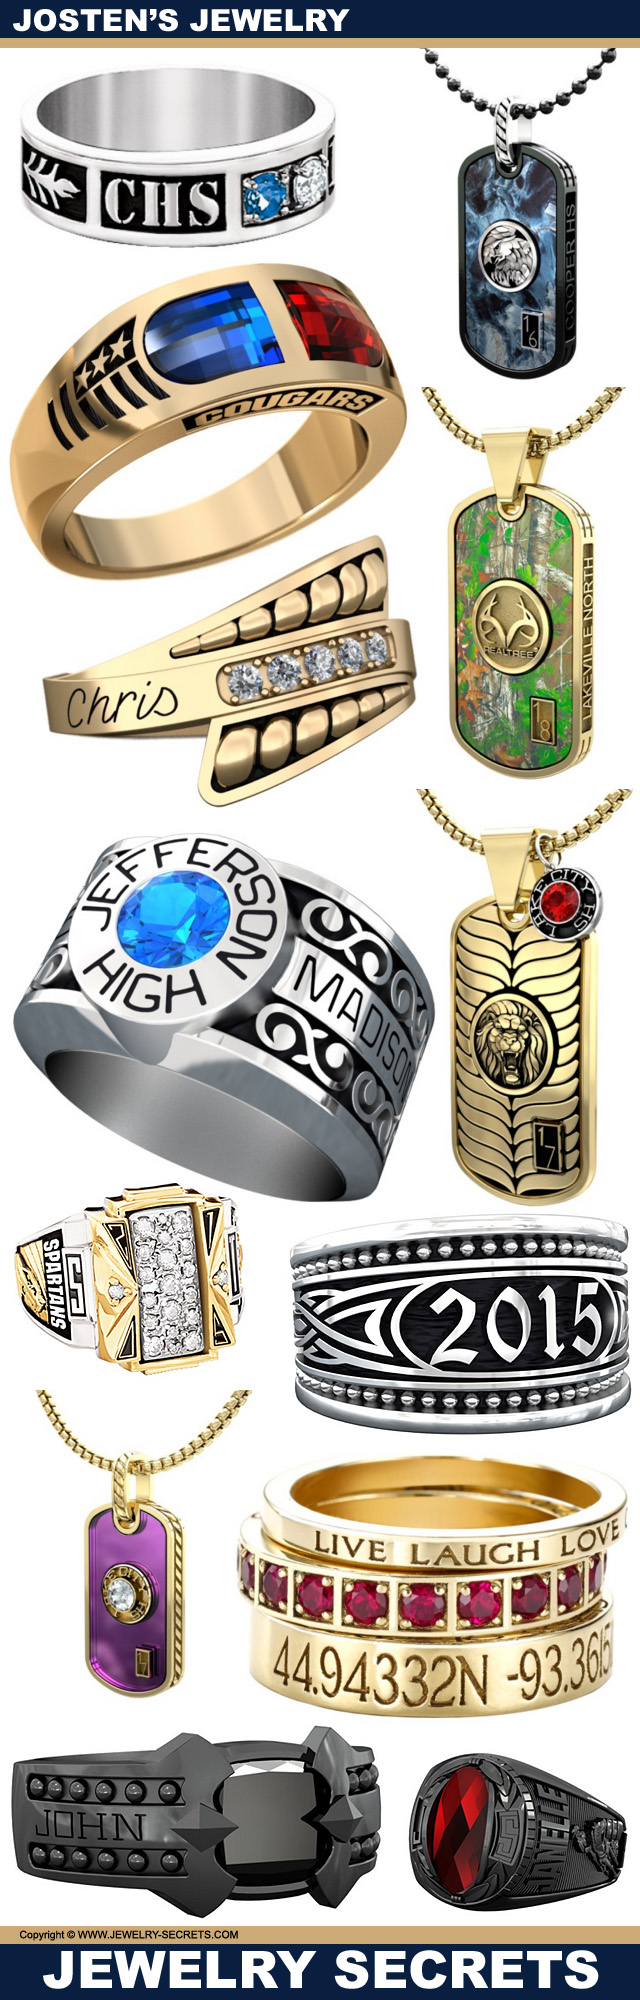 White Lustrium : white, lustrium, GOODBYE, ARTCARVED,, HELLO, JOSTENS!, Jewelry, Secrets